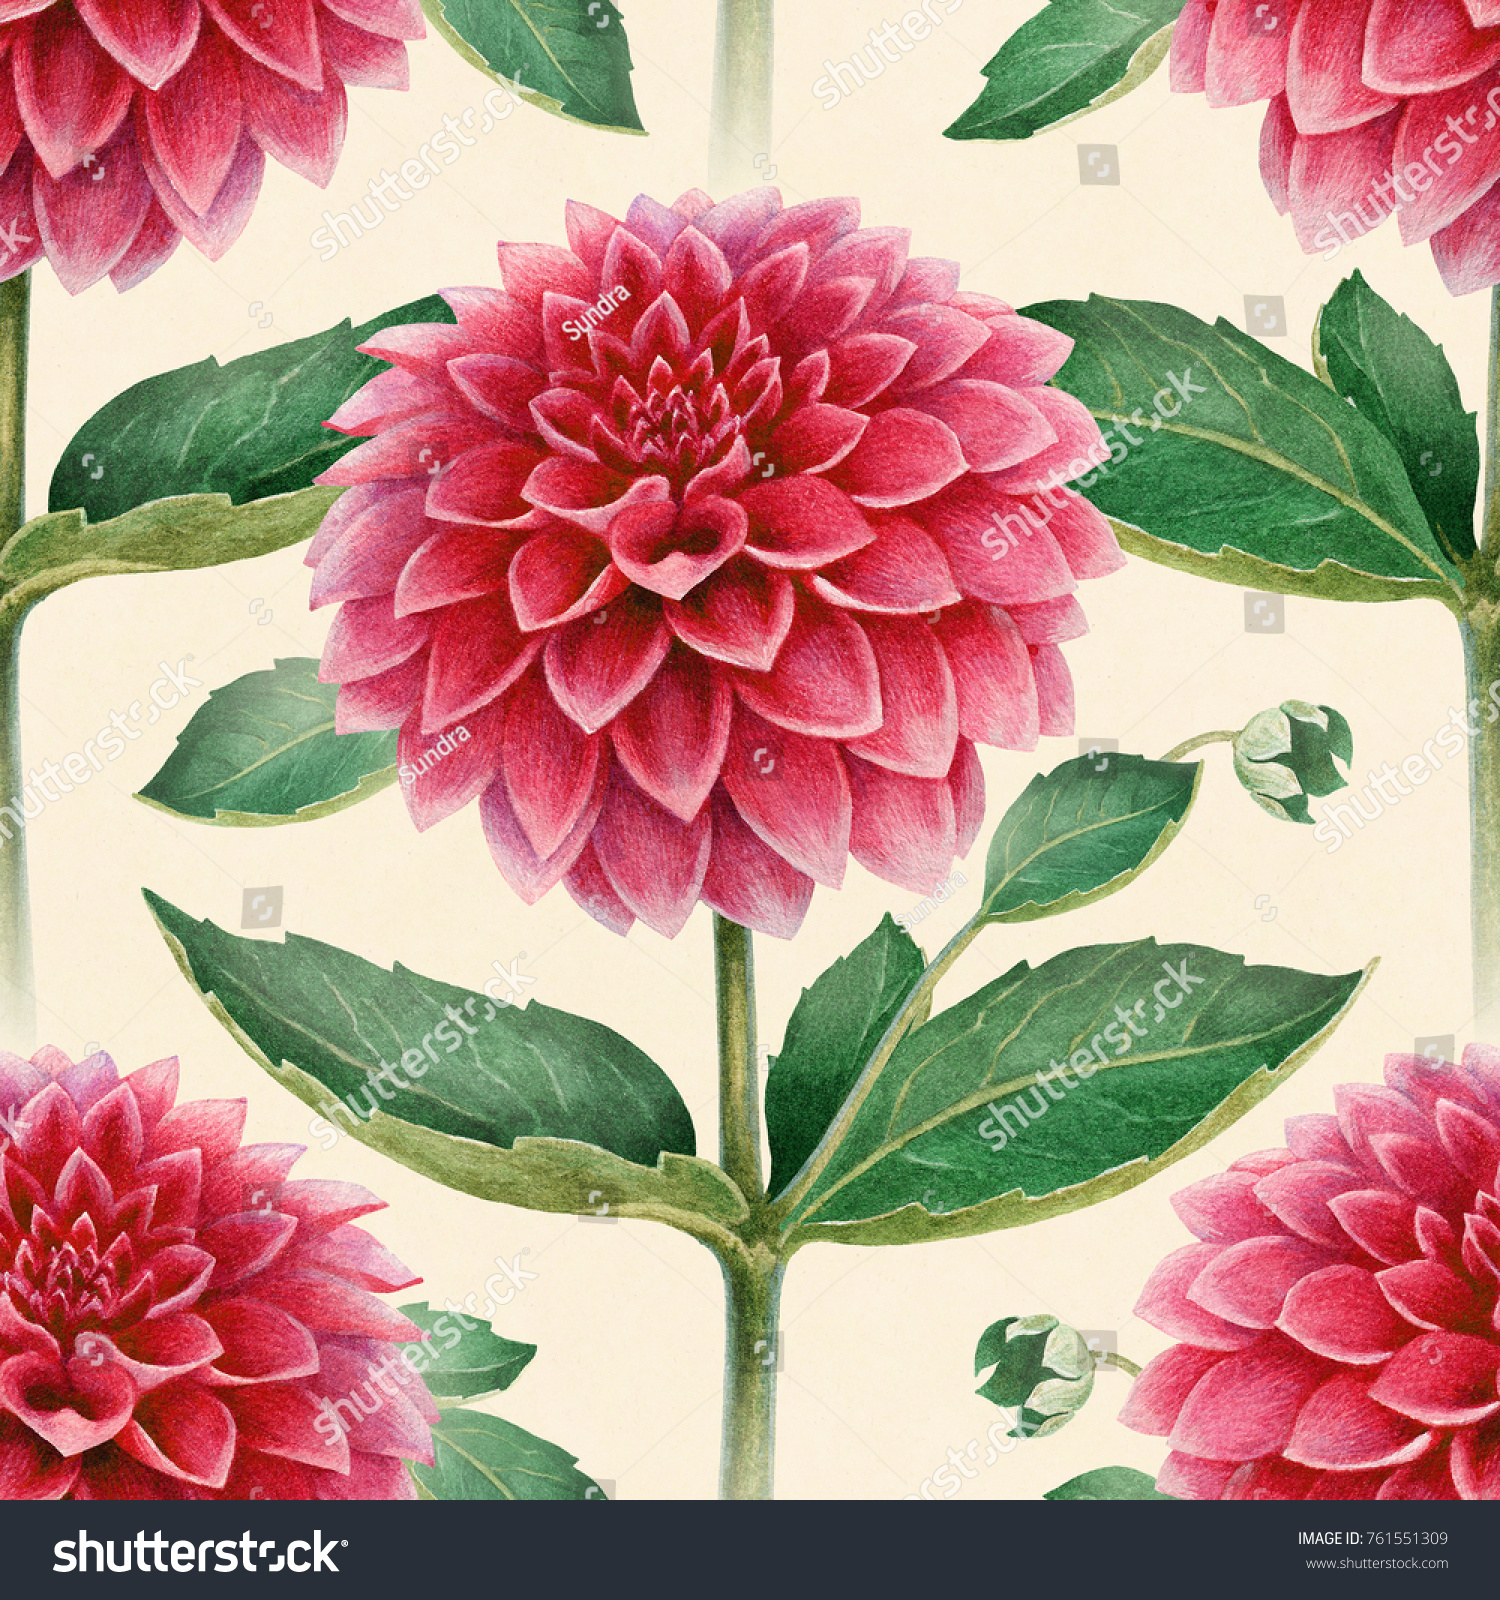 Watercolor illustration dahlia flowers seamless pattern stock watercolor illustration of dahlia flowers seamless pattern izmirmasajfo